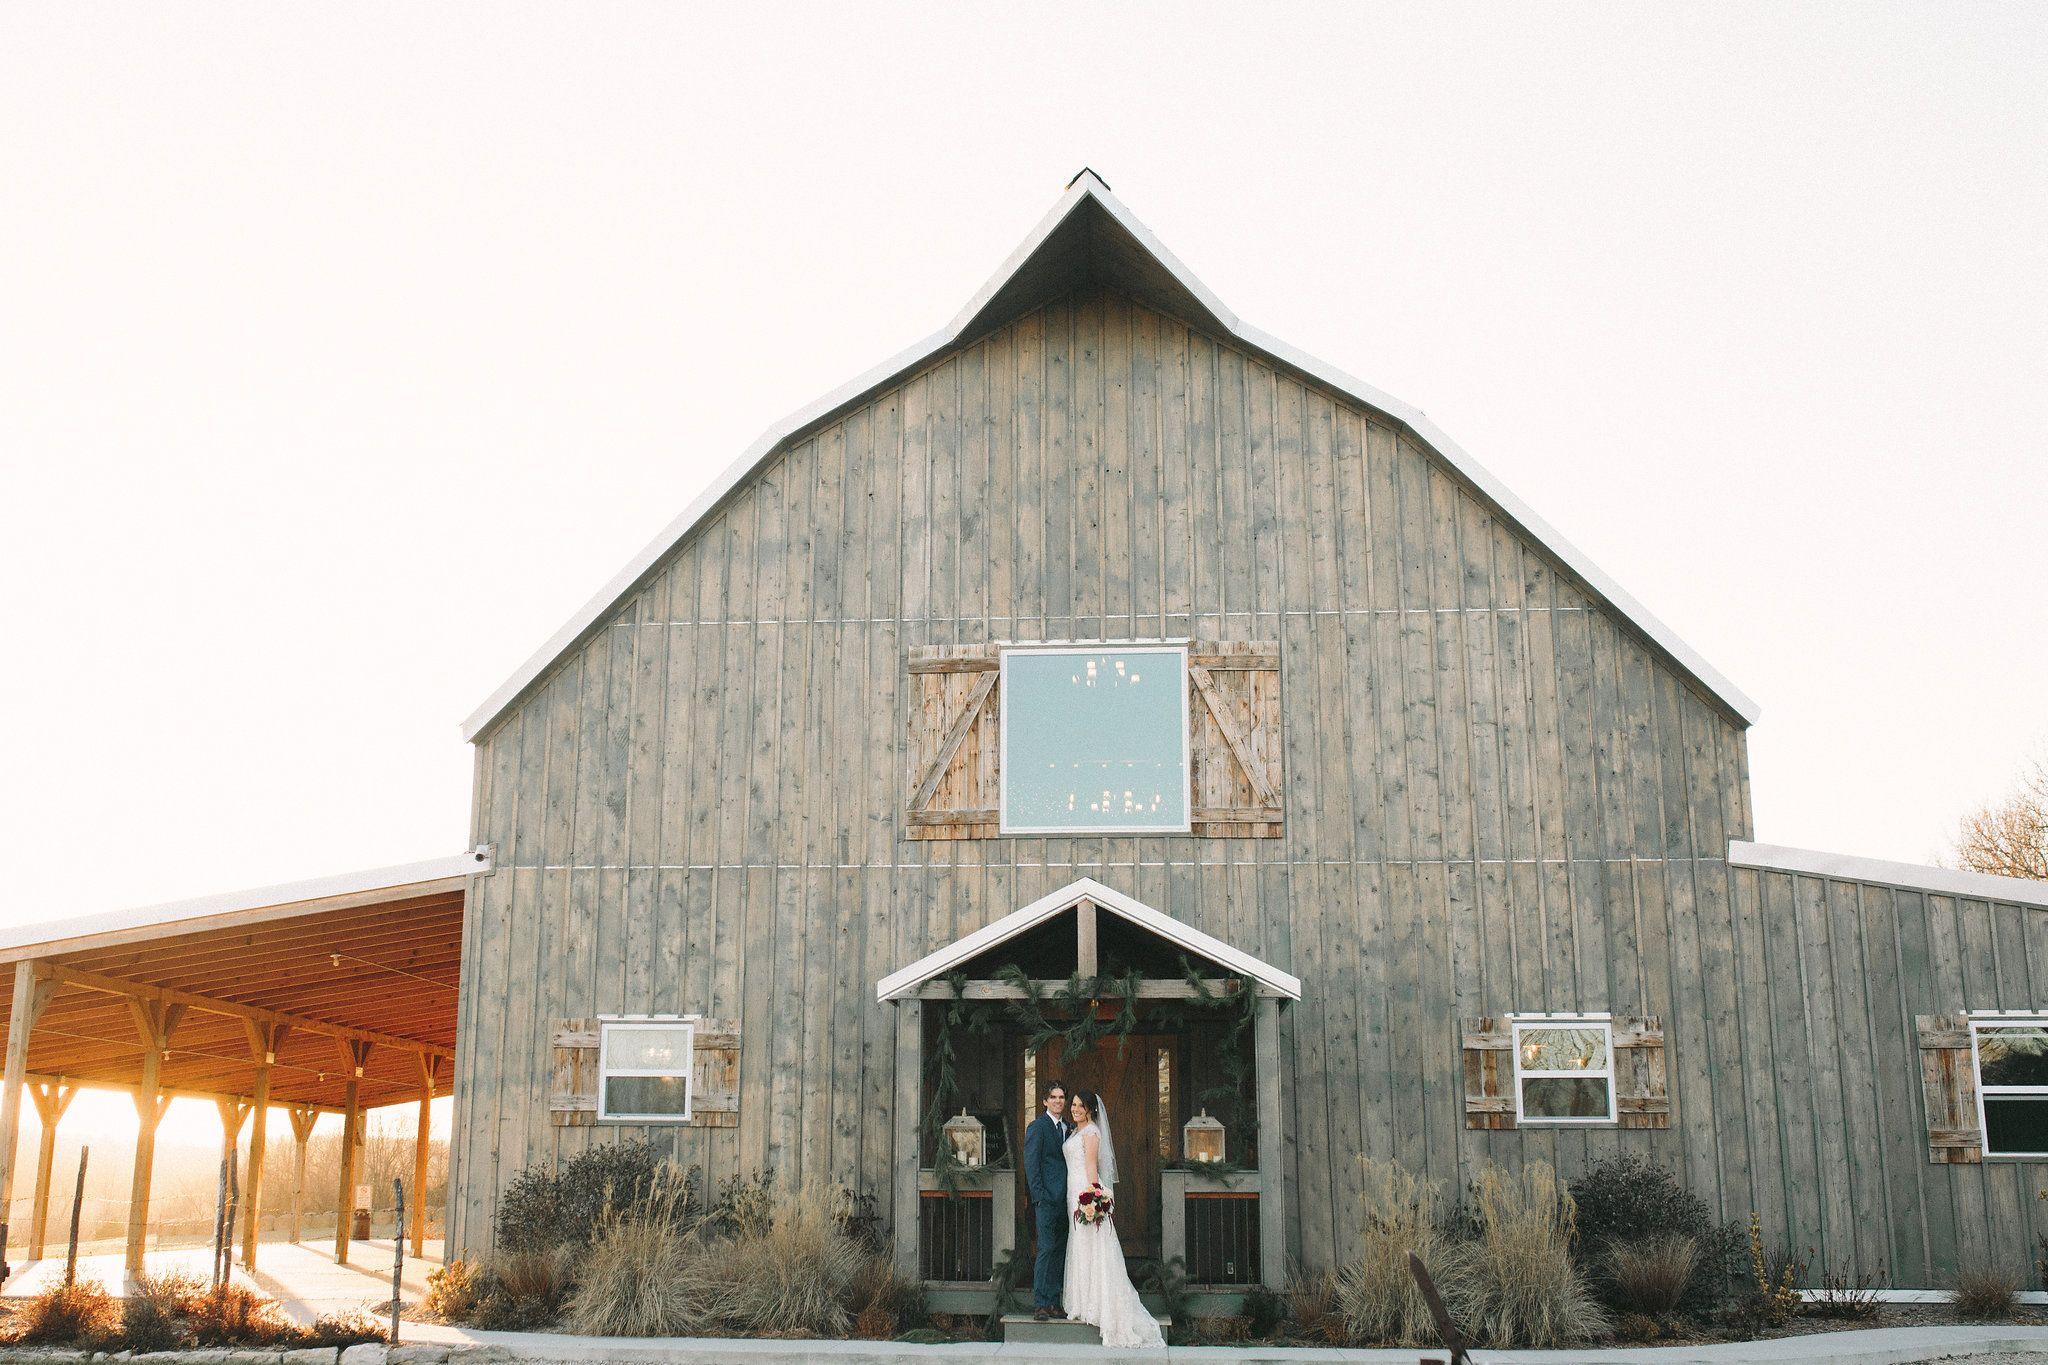 Art deco wedding gambrel barn verona missouri photos by